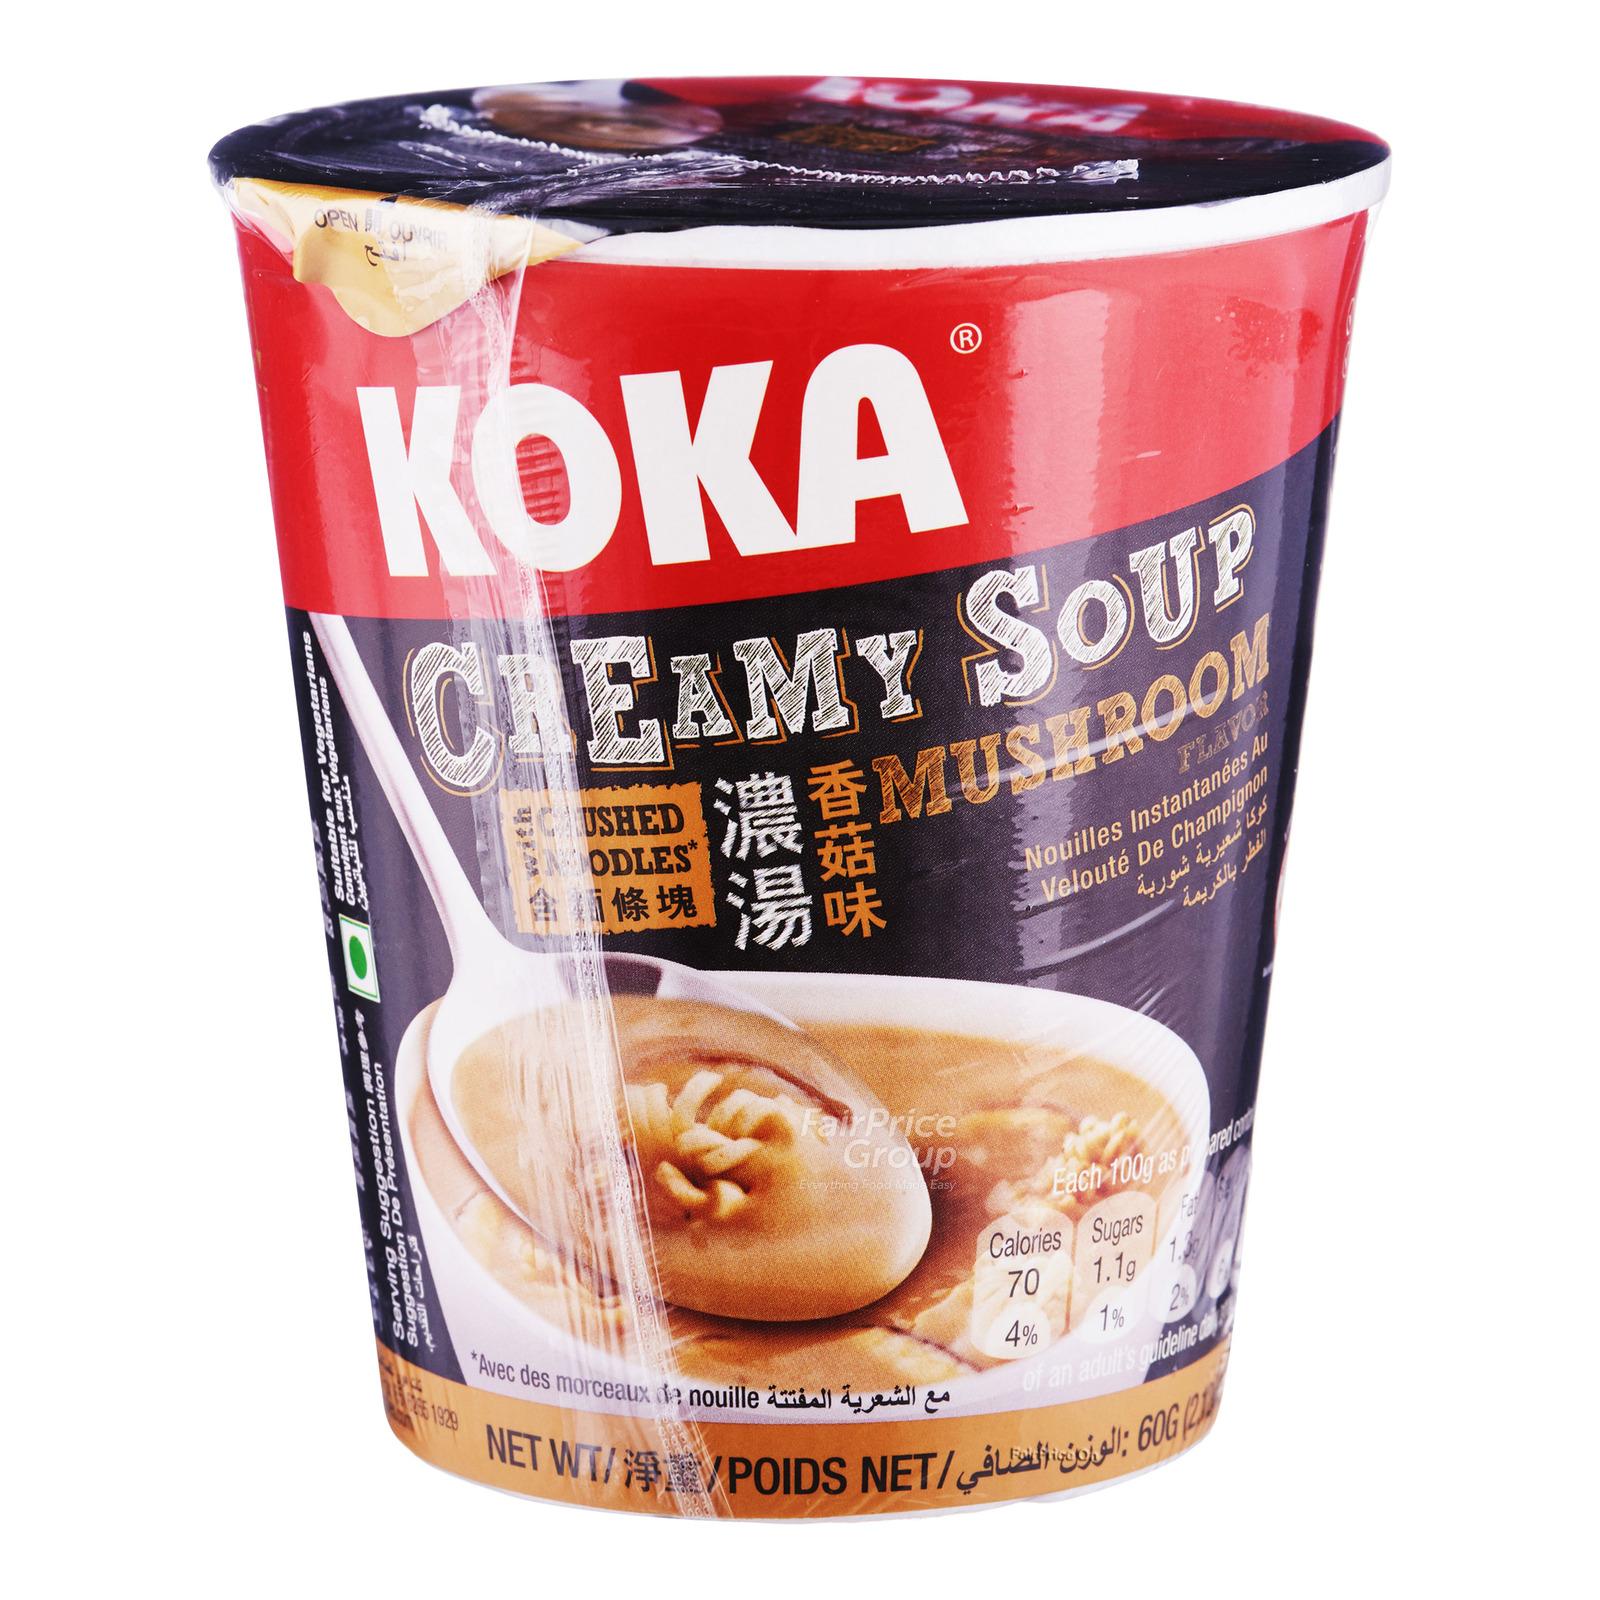 Koka Instant Creamy Soup with Crushed Noodles - Mushroom